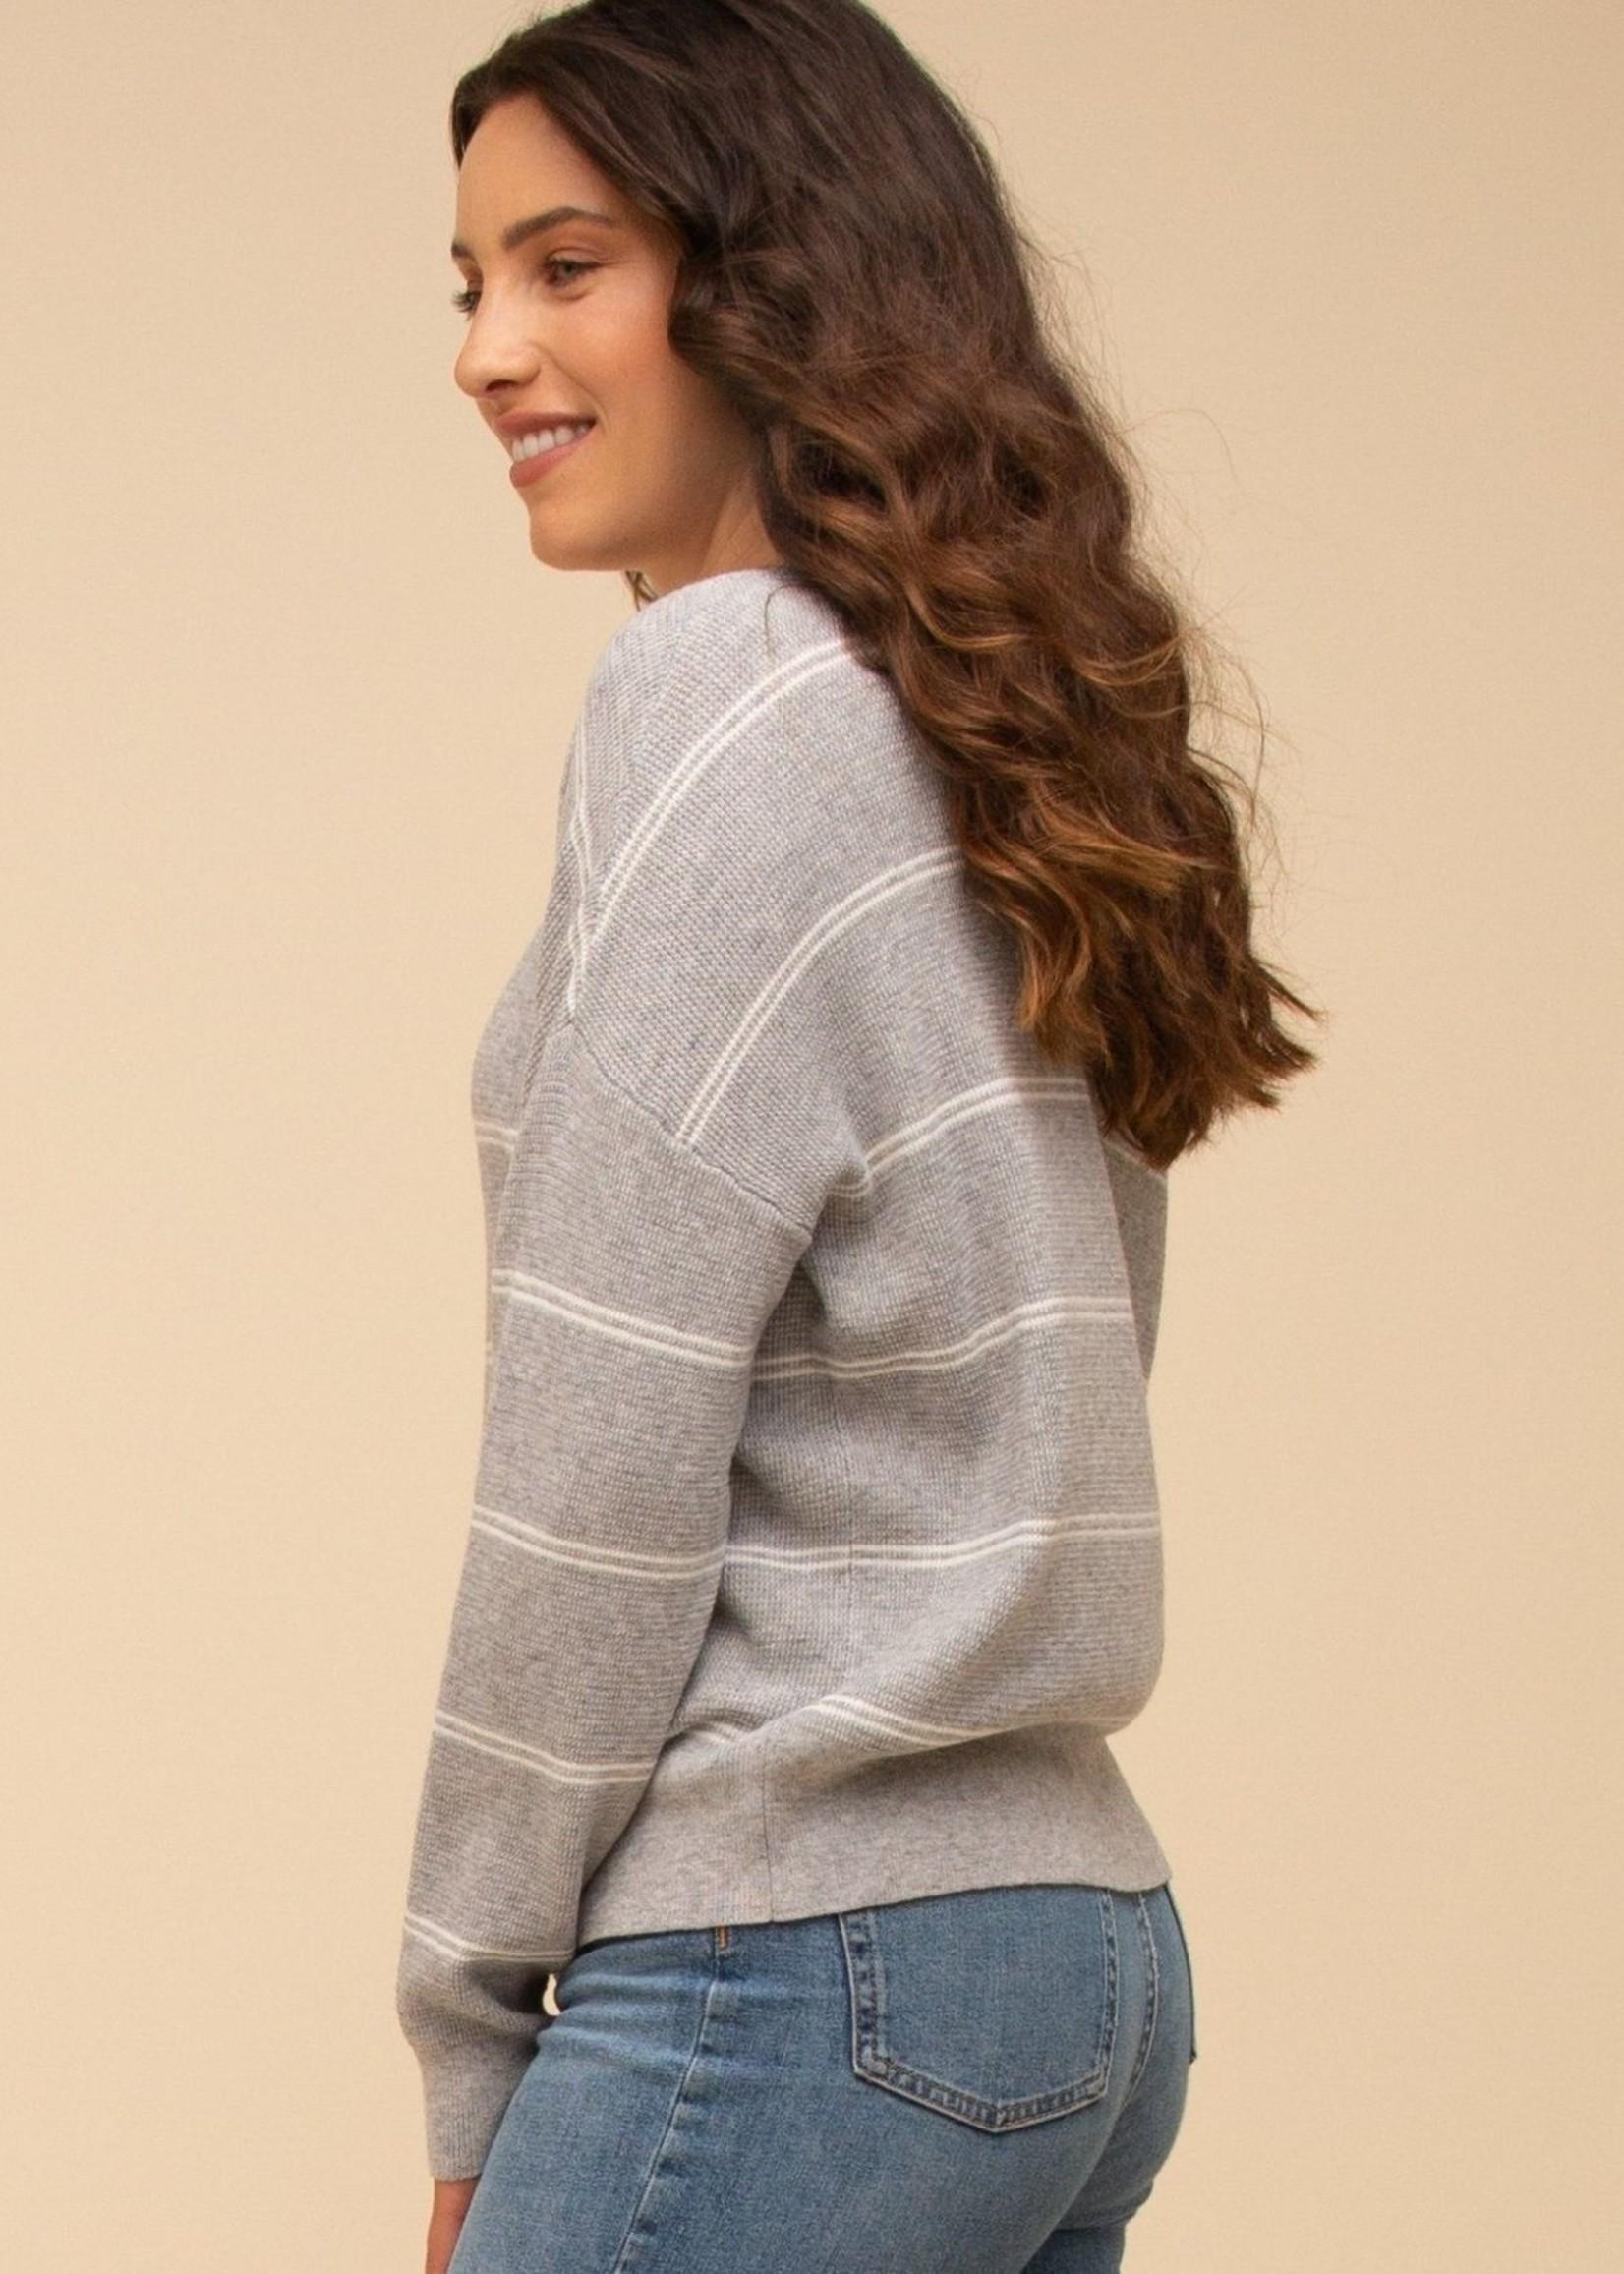 Thread & Supply Jemma Top - Grey/Ivory